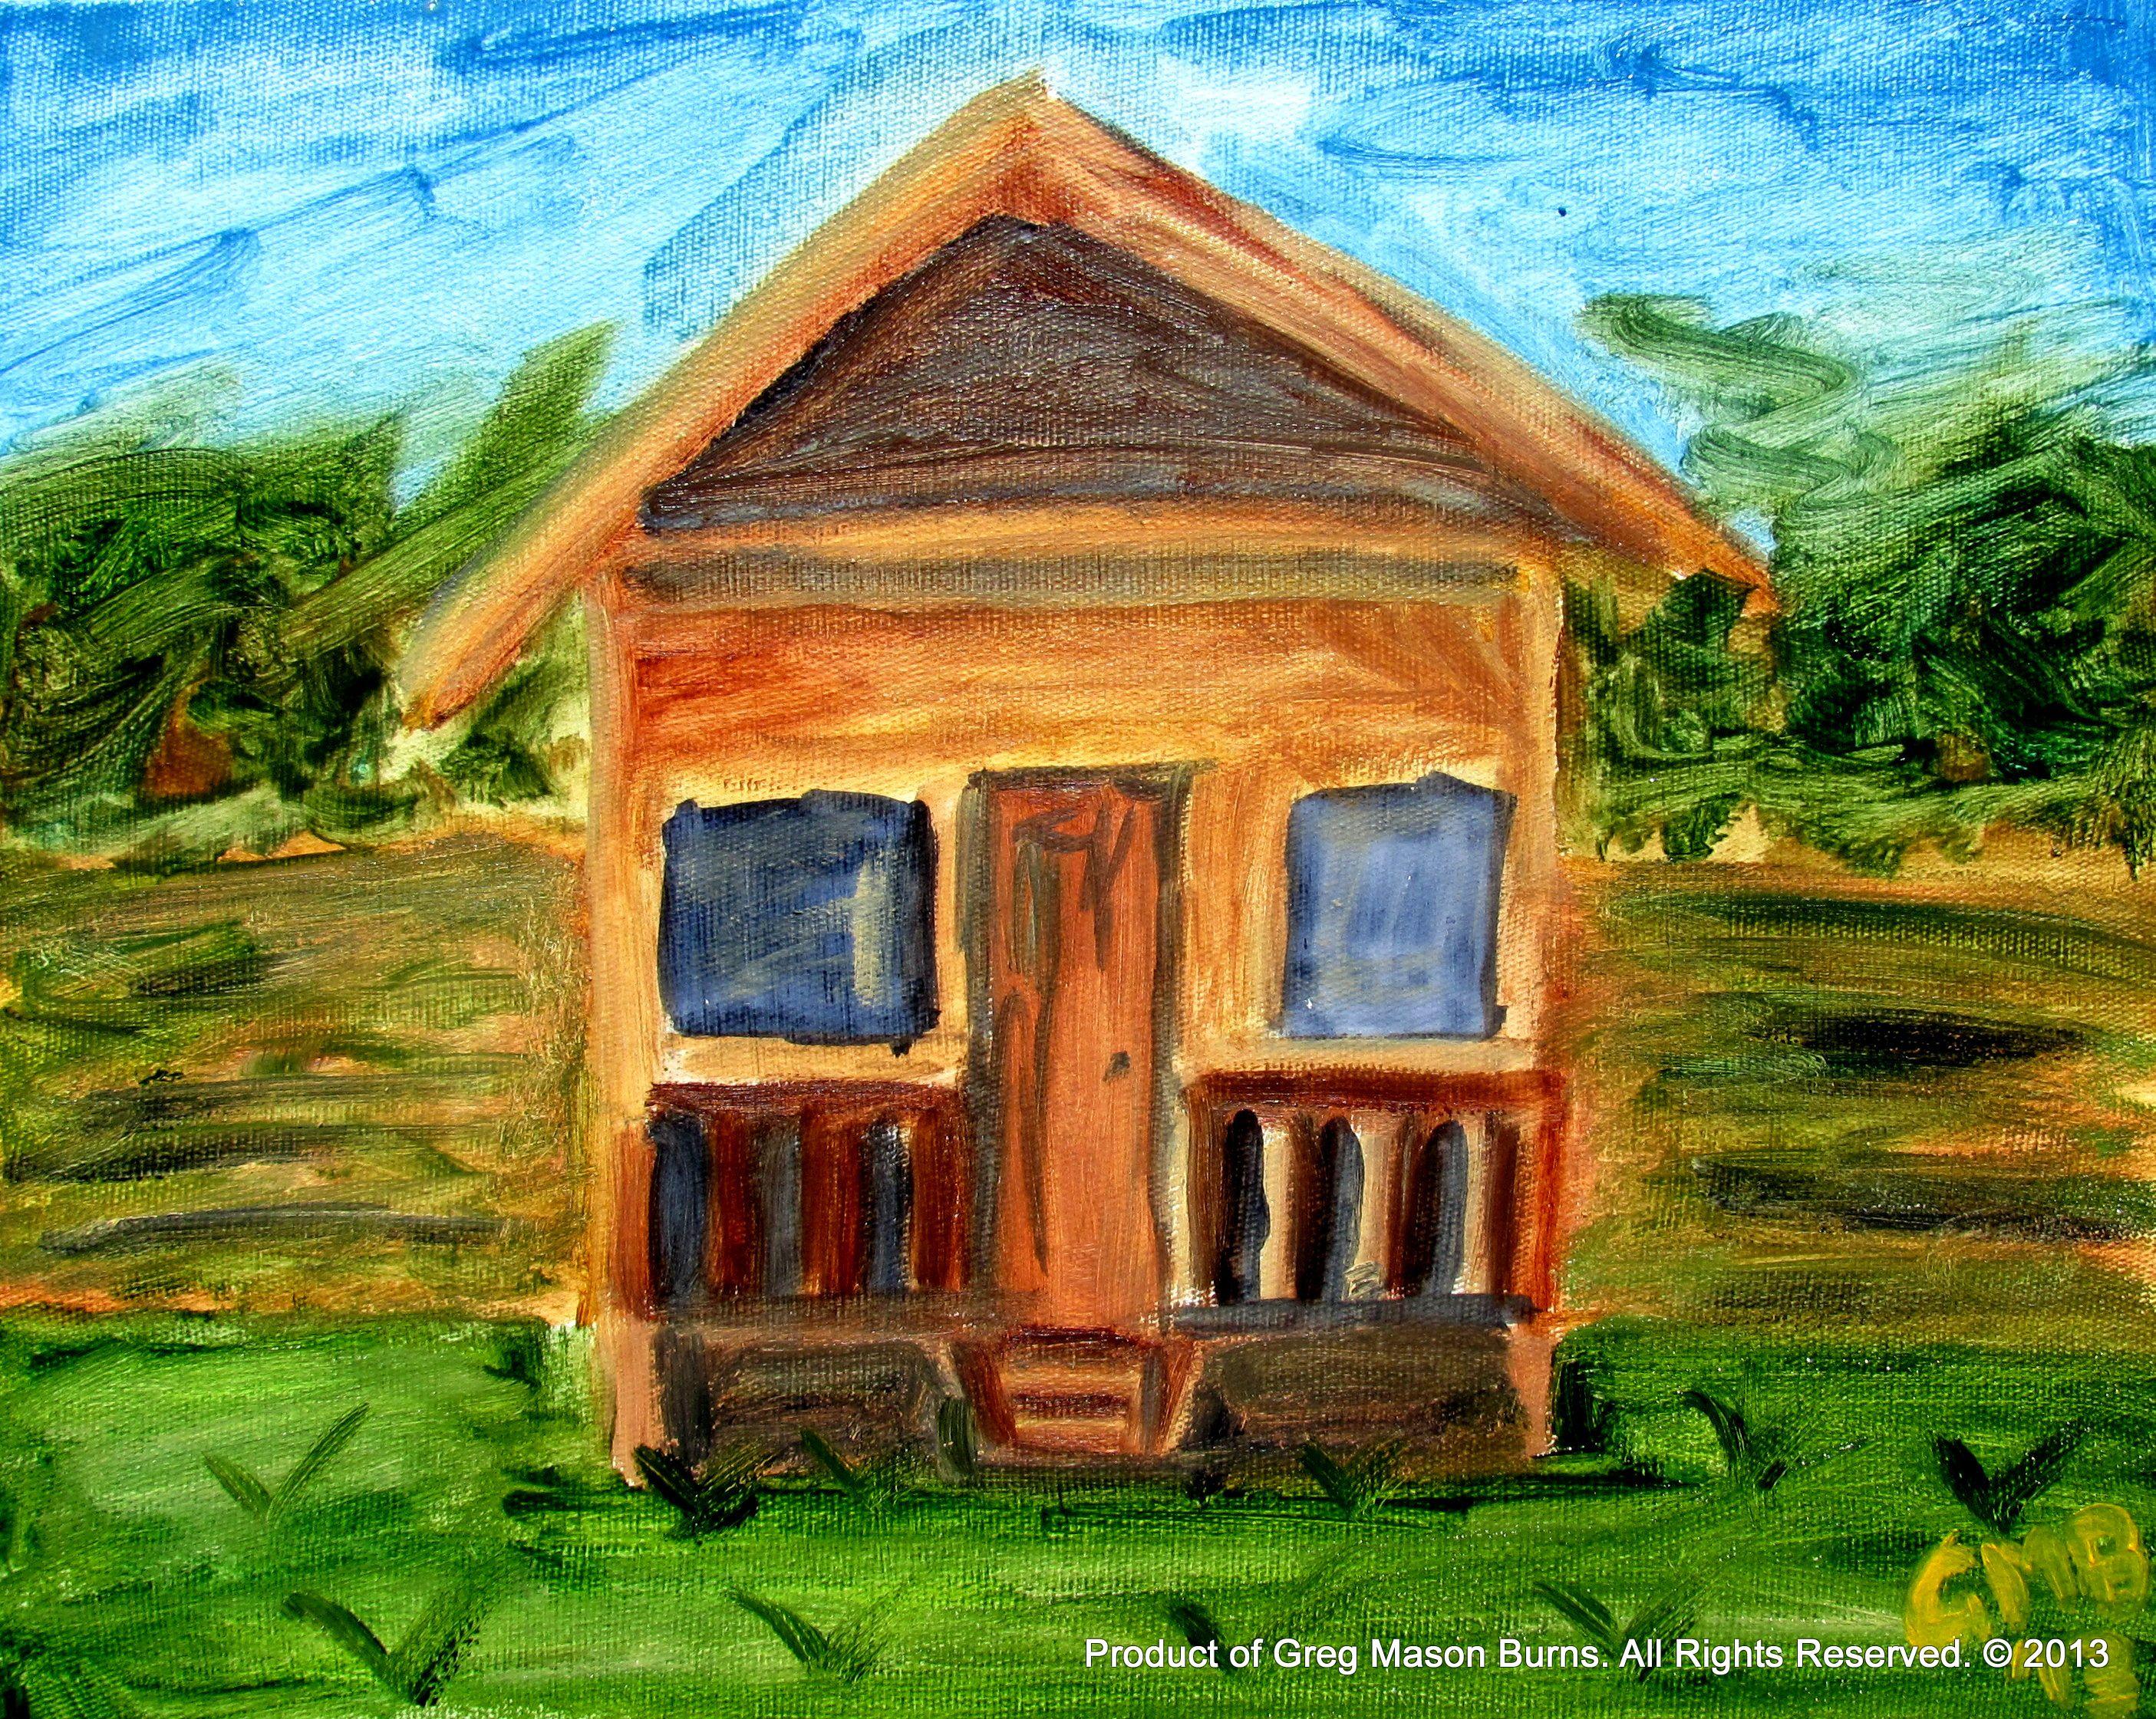 Brasilian Farmhouse Oil on Canvas (2013) 24 x 30 cm  www.gregmasonburns.com Prints - http://fineartamerica.com/featured/brasilian-farmhouse-greg-mason-burns.html